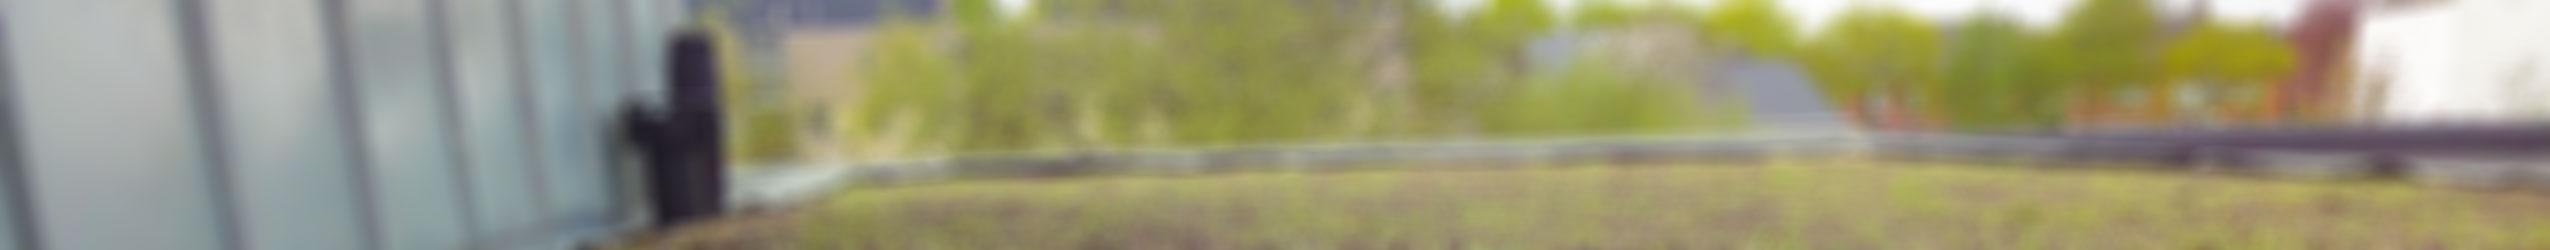 De-Tuinman-aanleg-van-groendaken-17